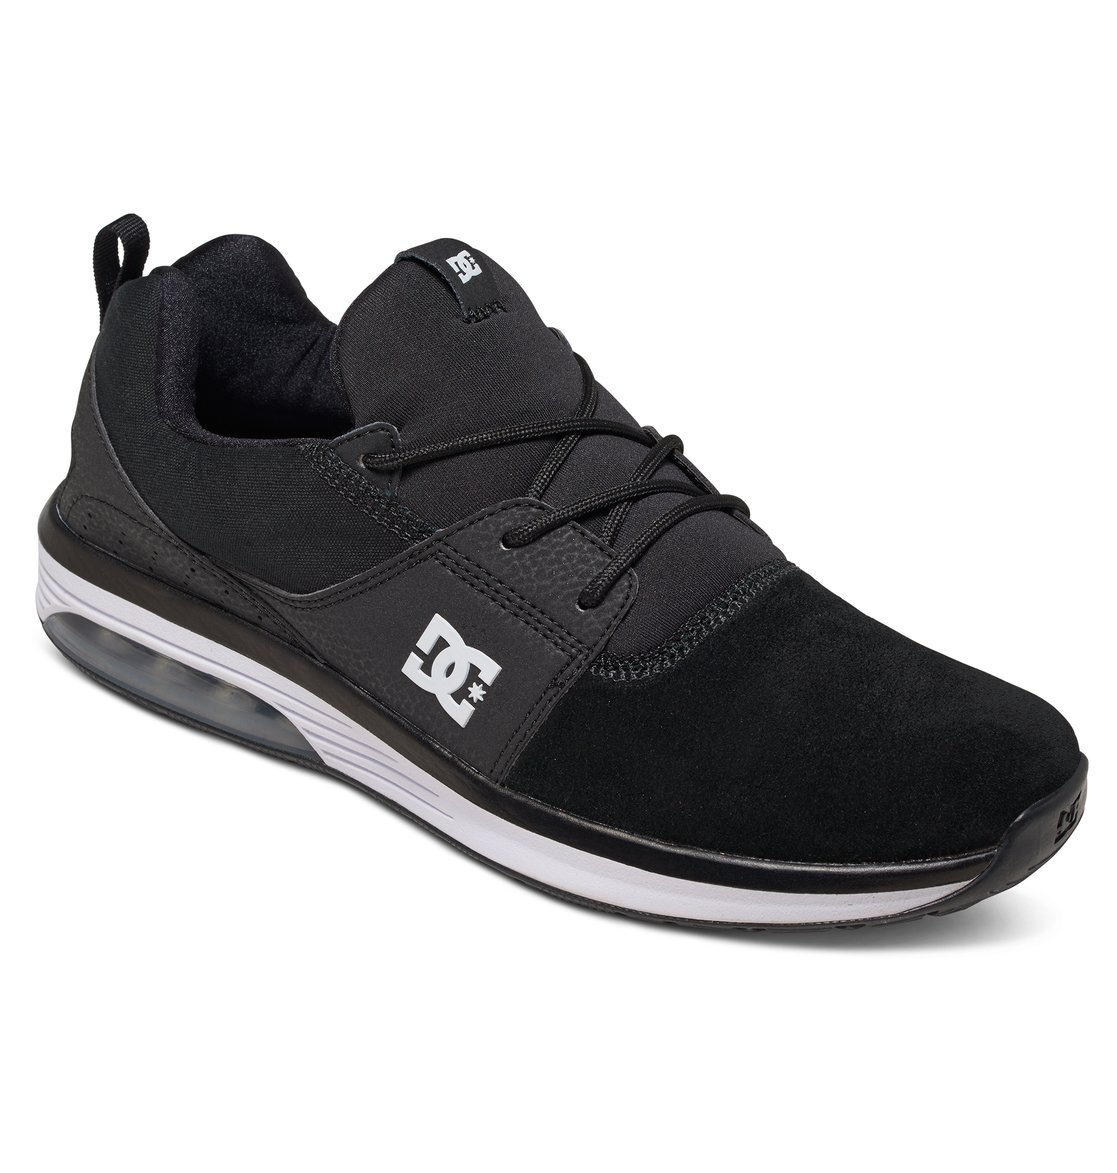 Zapatos Dc Heathrow Ia Negro (Eu 46 / Us 12 , Negro)